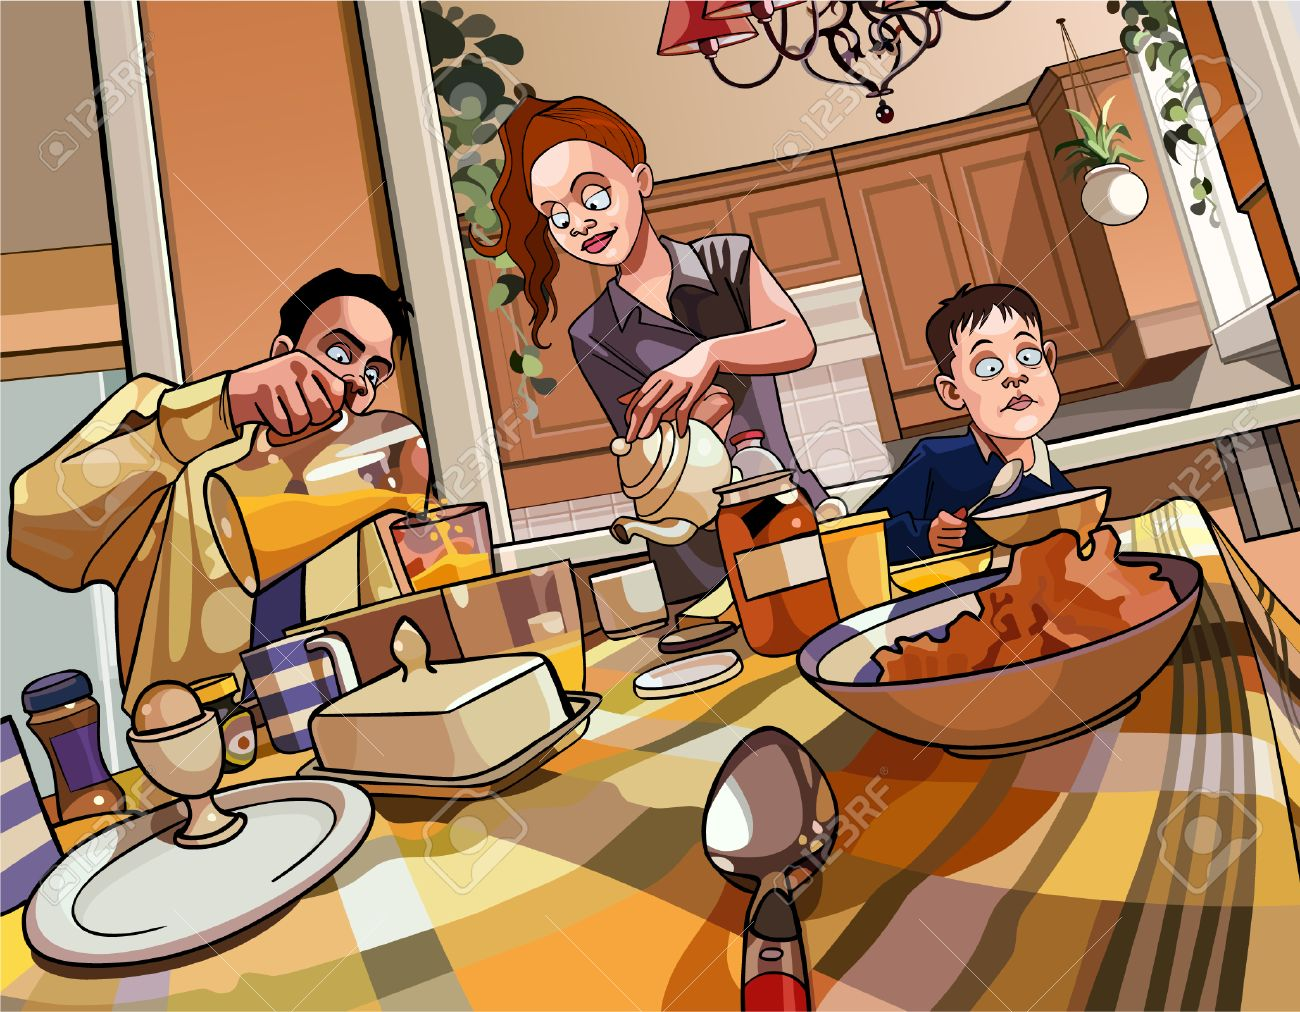 mesa de desayuno de la familia de dibujos animados Foto de archivo - 38905177